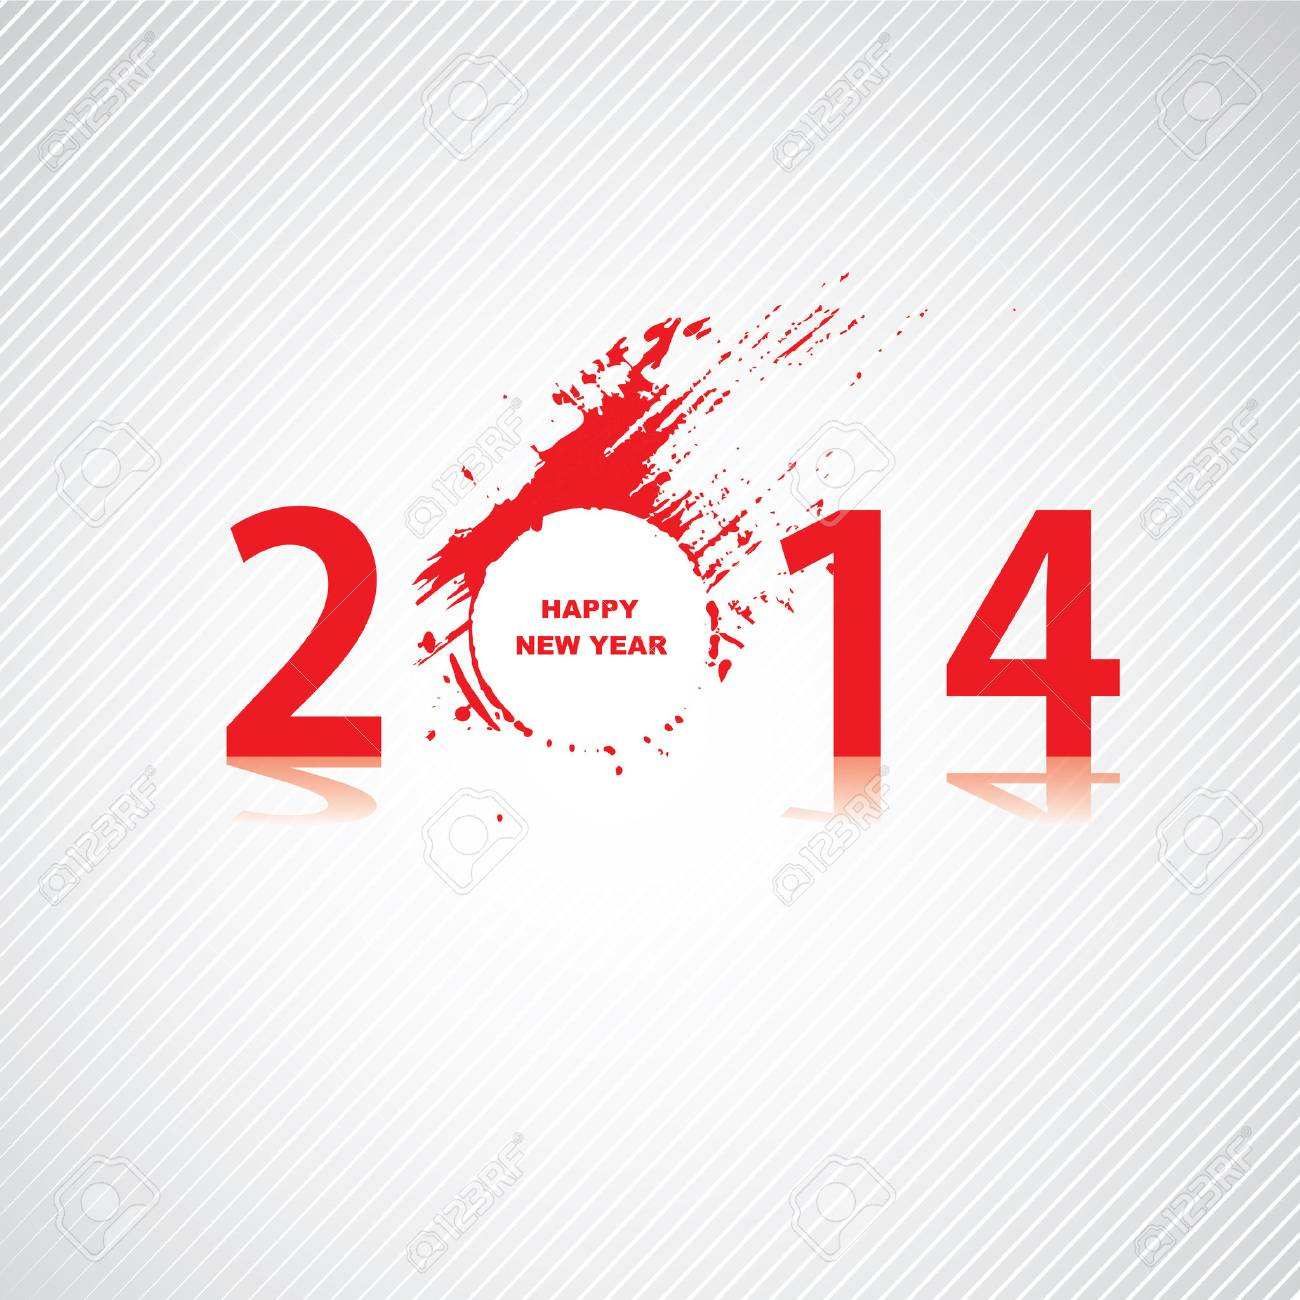 New year 2014 design Stock Vector - 22419806